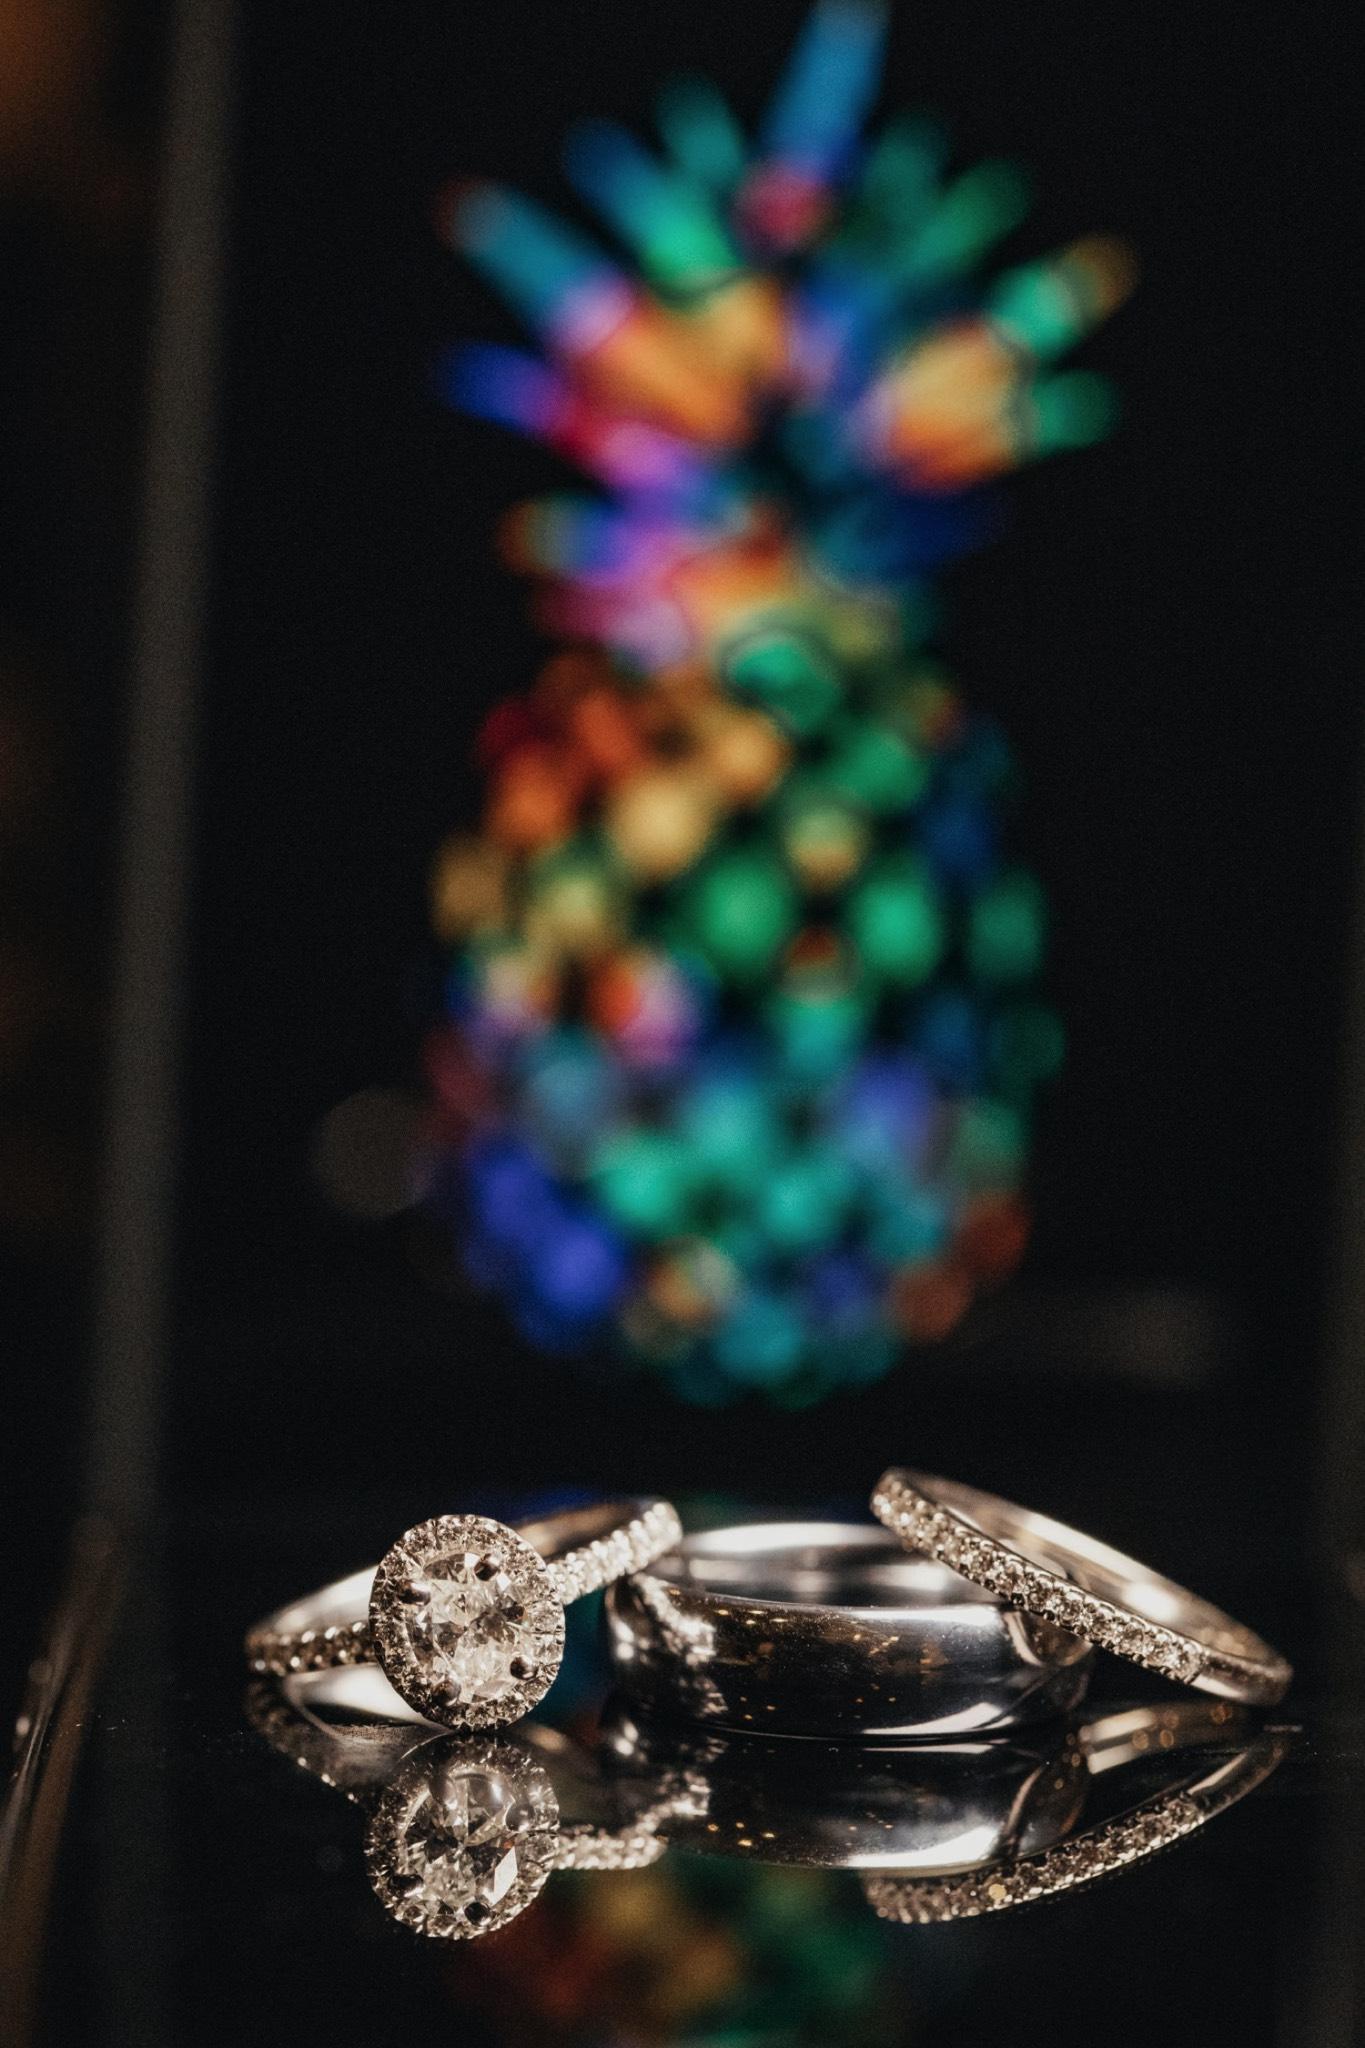 Patrick Henry Ballroom - Ring pictures - Pineapple - Pat Cori Photography